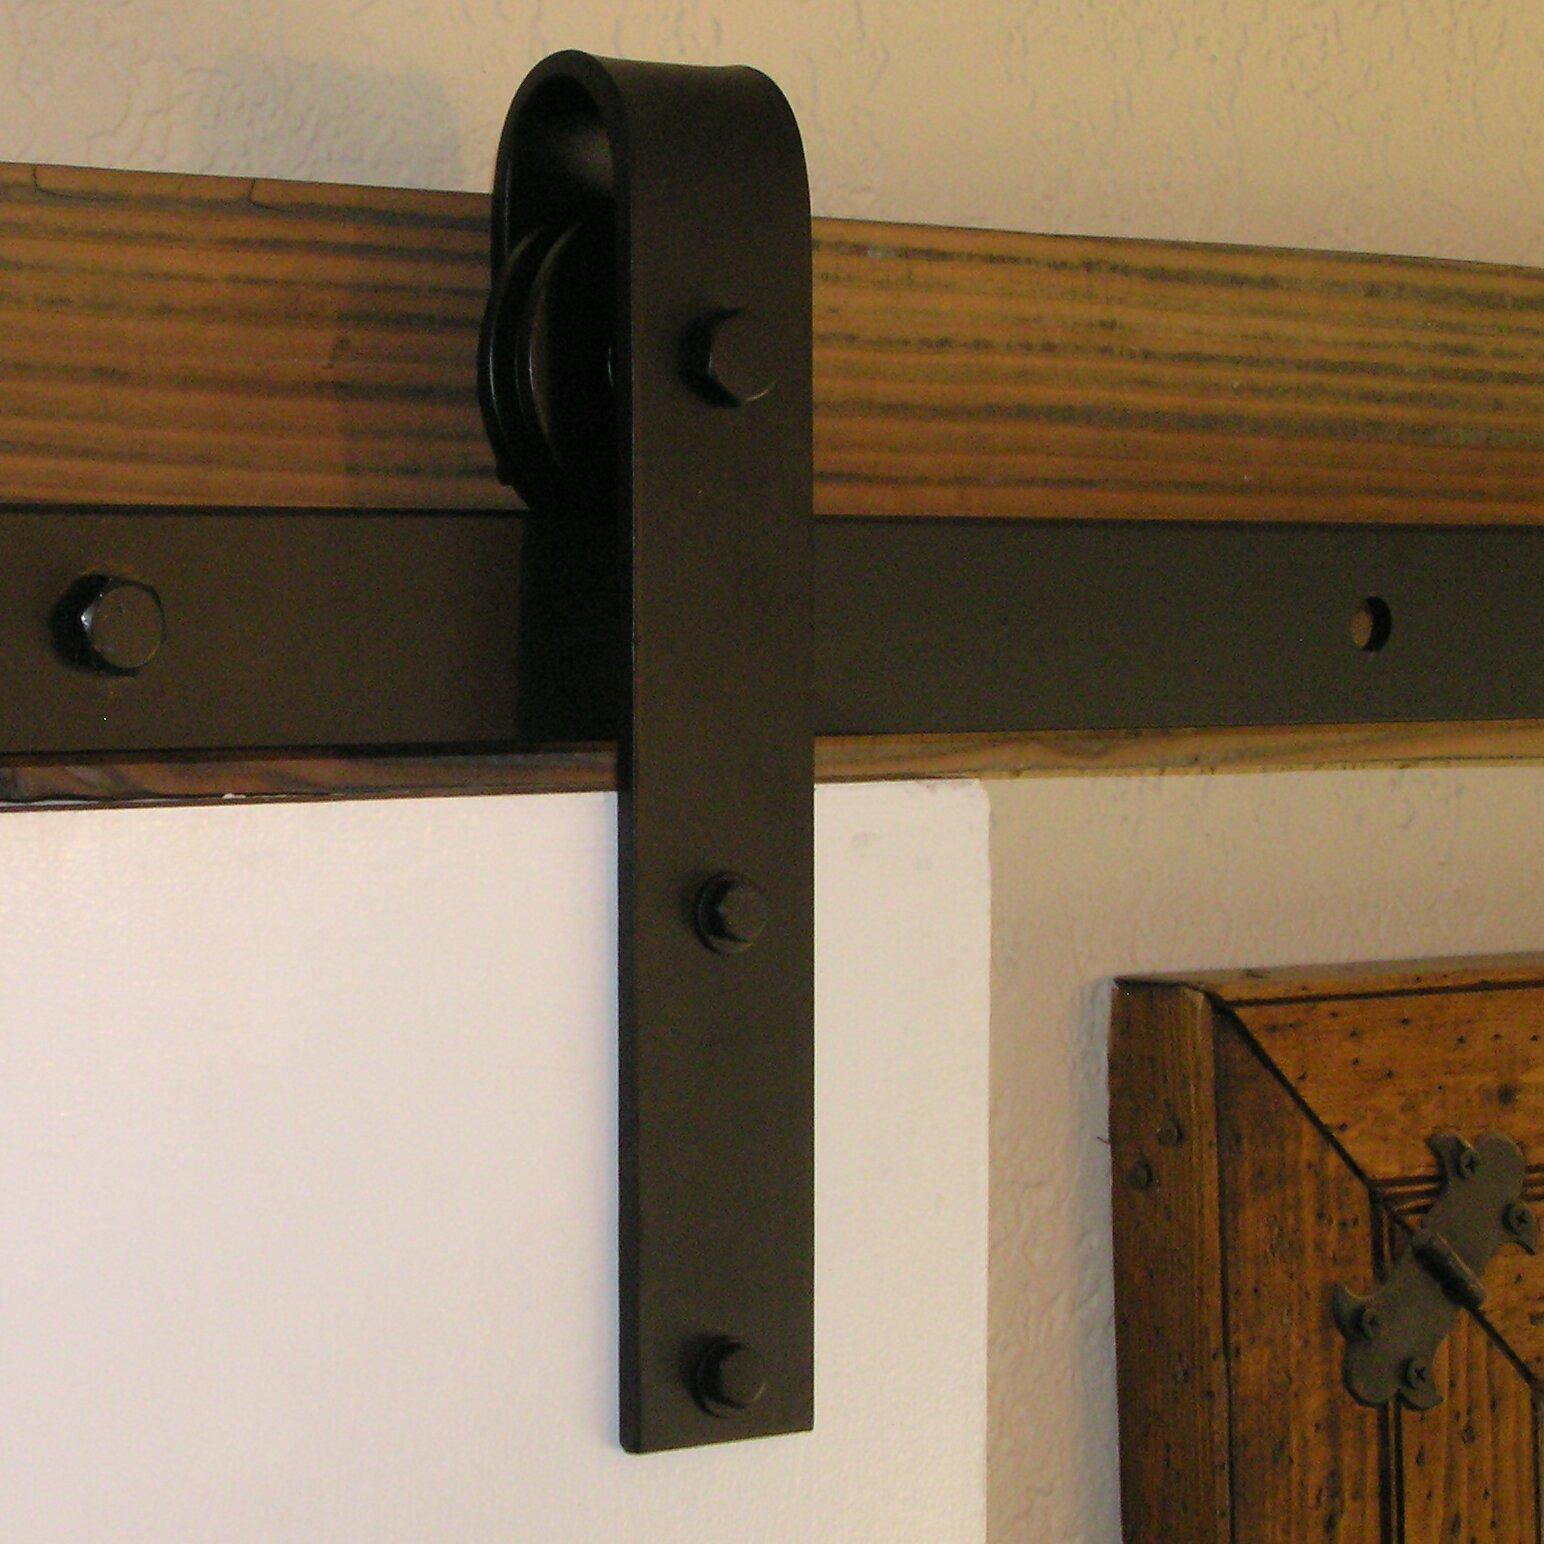 Agave ironworks barn door rolling hardware kit reviews for Barn doors and hardware reviews